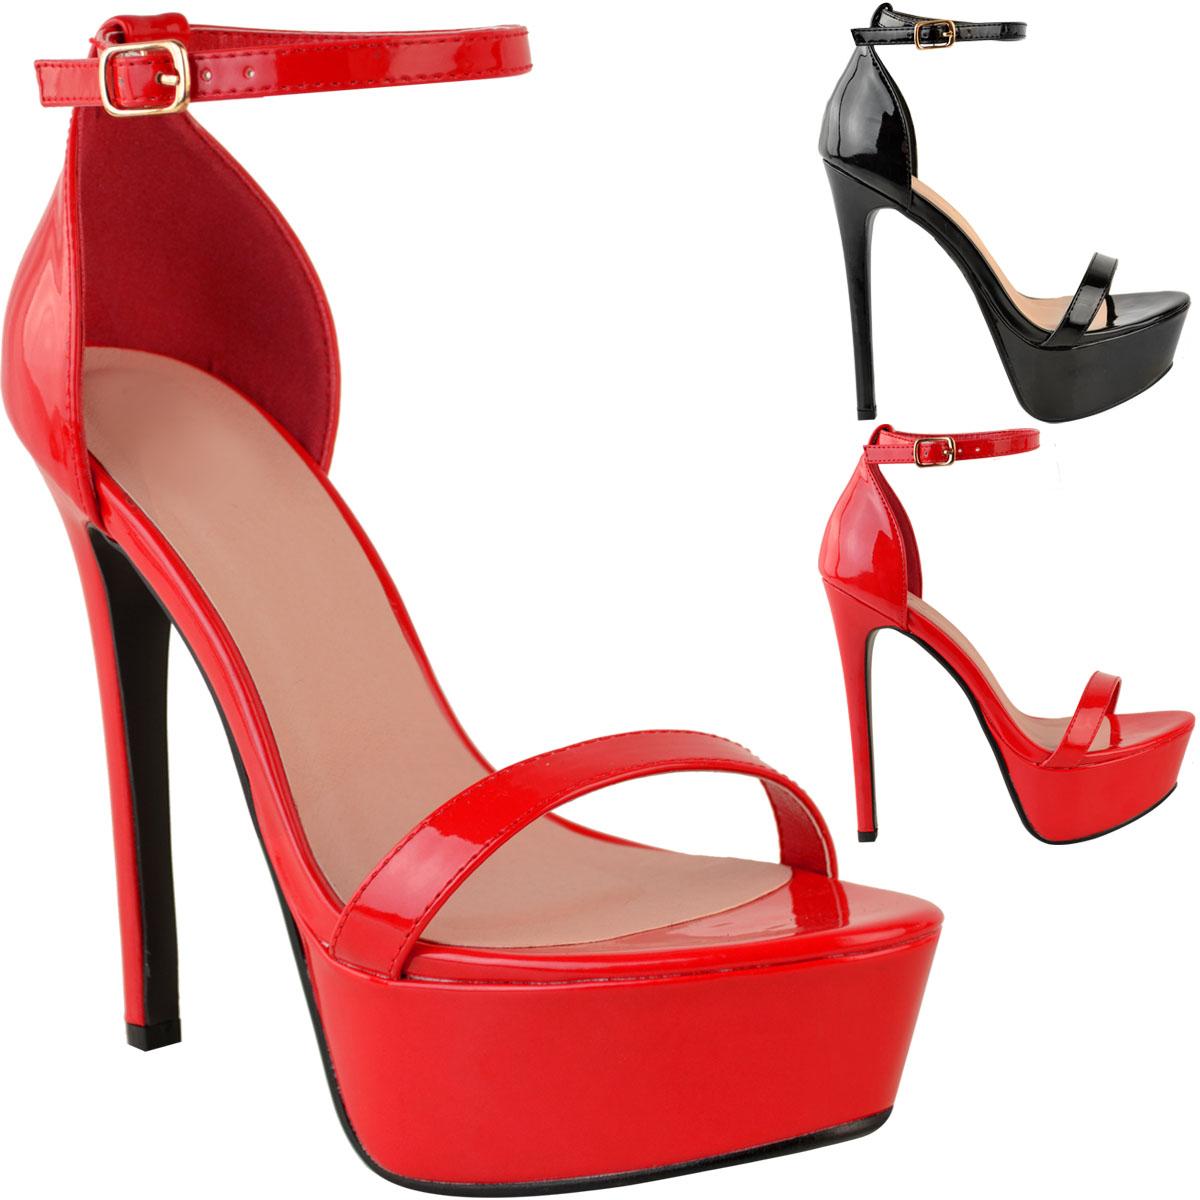 Para-mujeres-Damas-Plataforma-Tacon-Alto-Zapatos-Sandalias-Sexy-de-Fiesta-de-Baile-de-graduacion